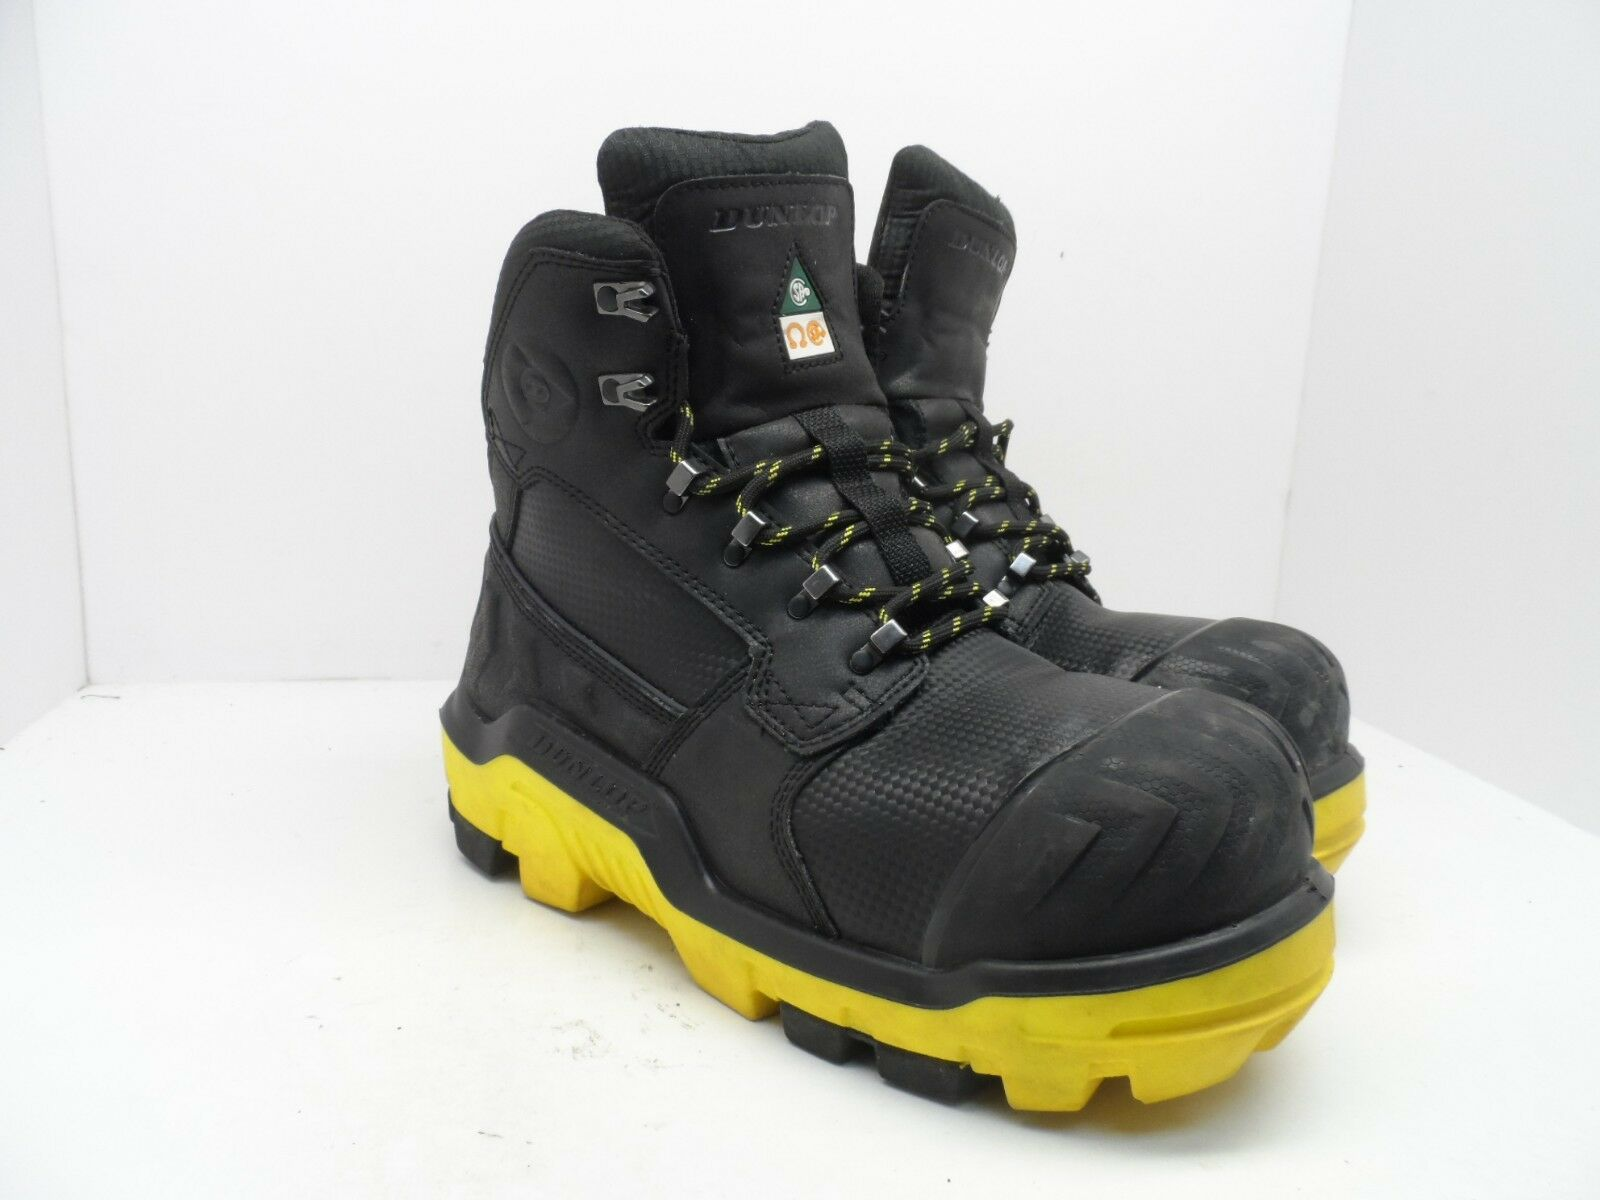 DUNLOP Men's 6'' Composite Toe Composite Plate Leather Work Boot Black Size 9.5M